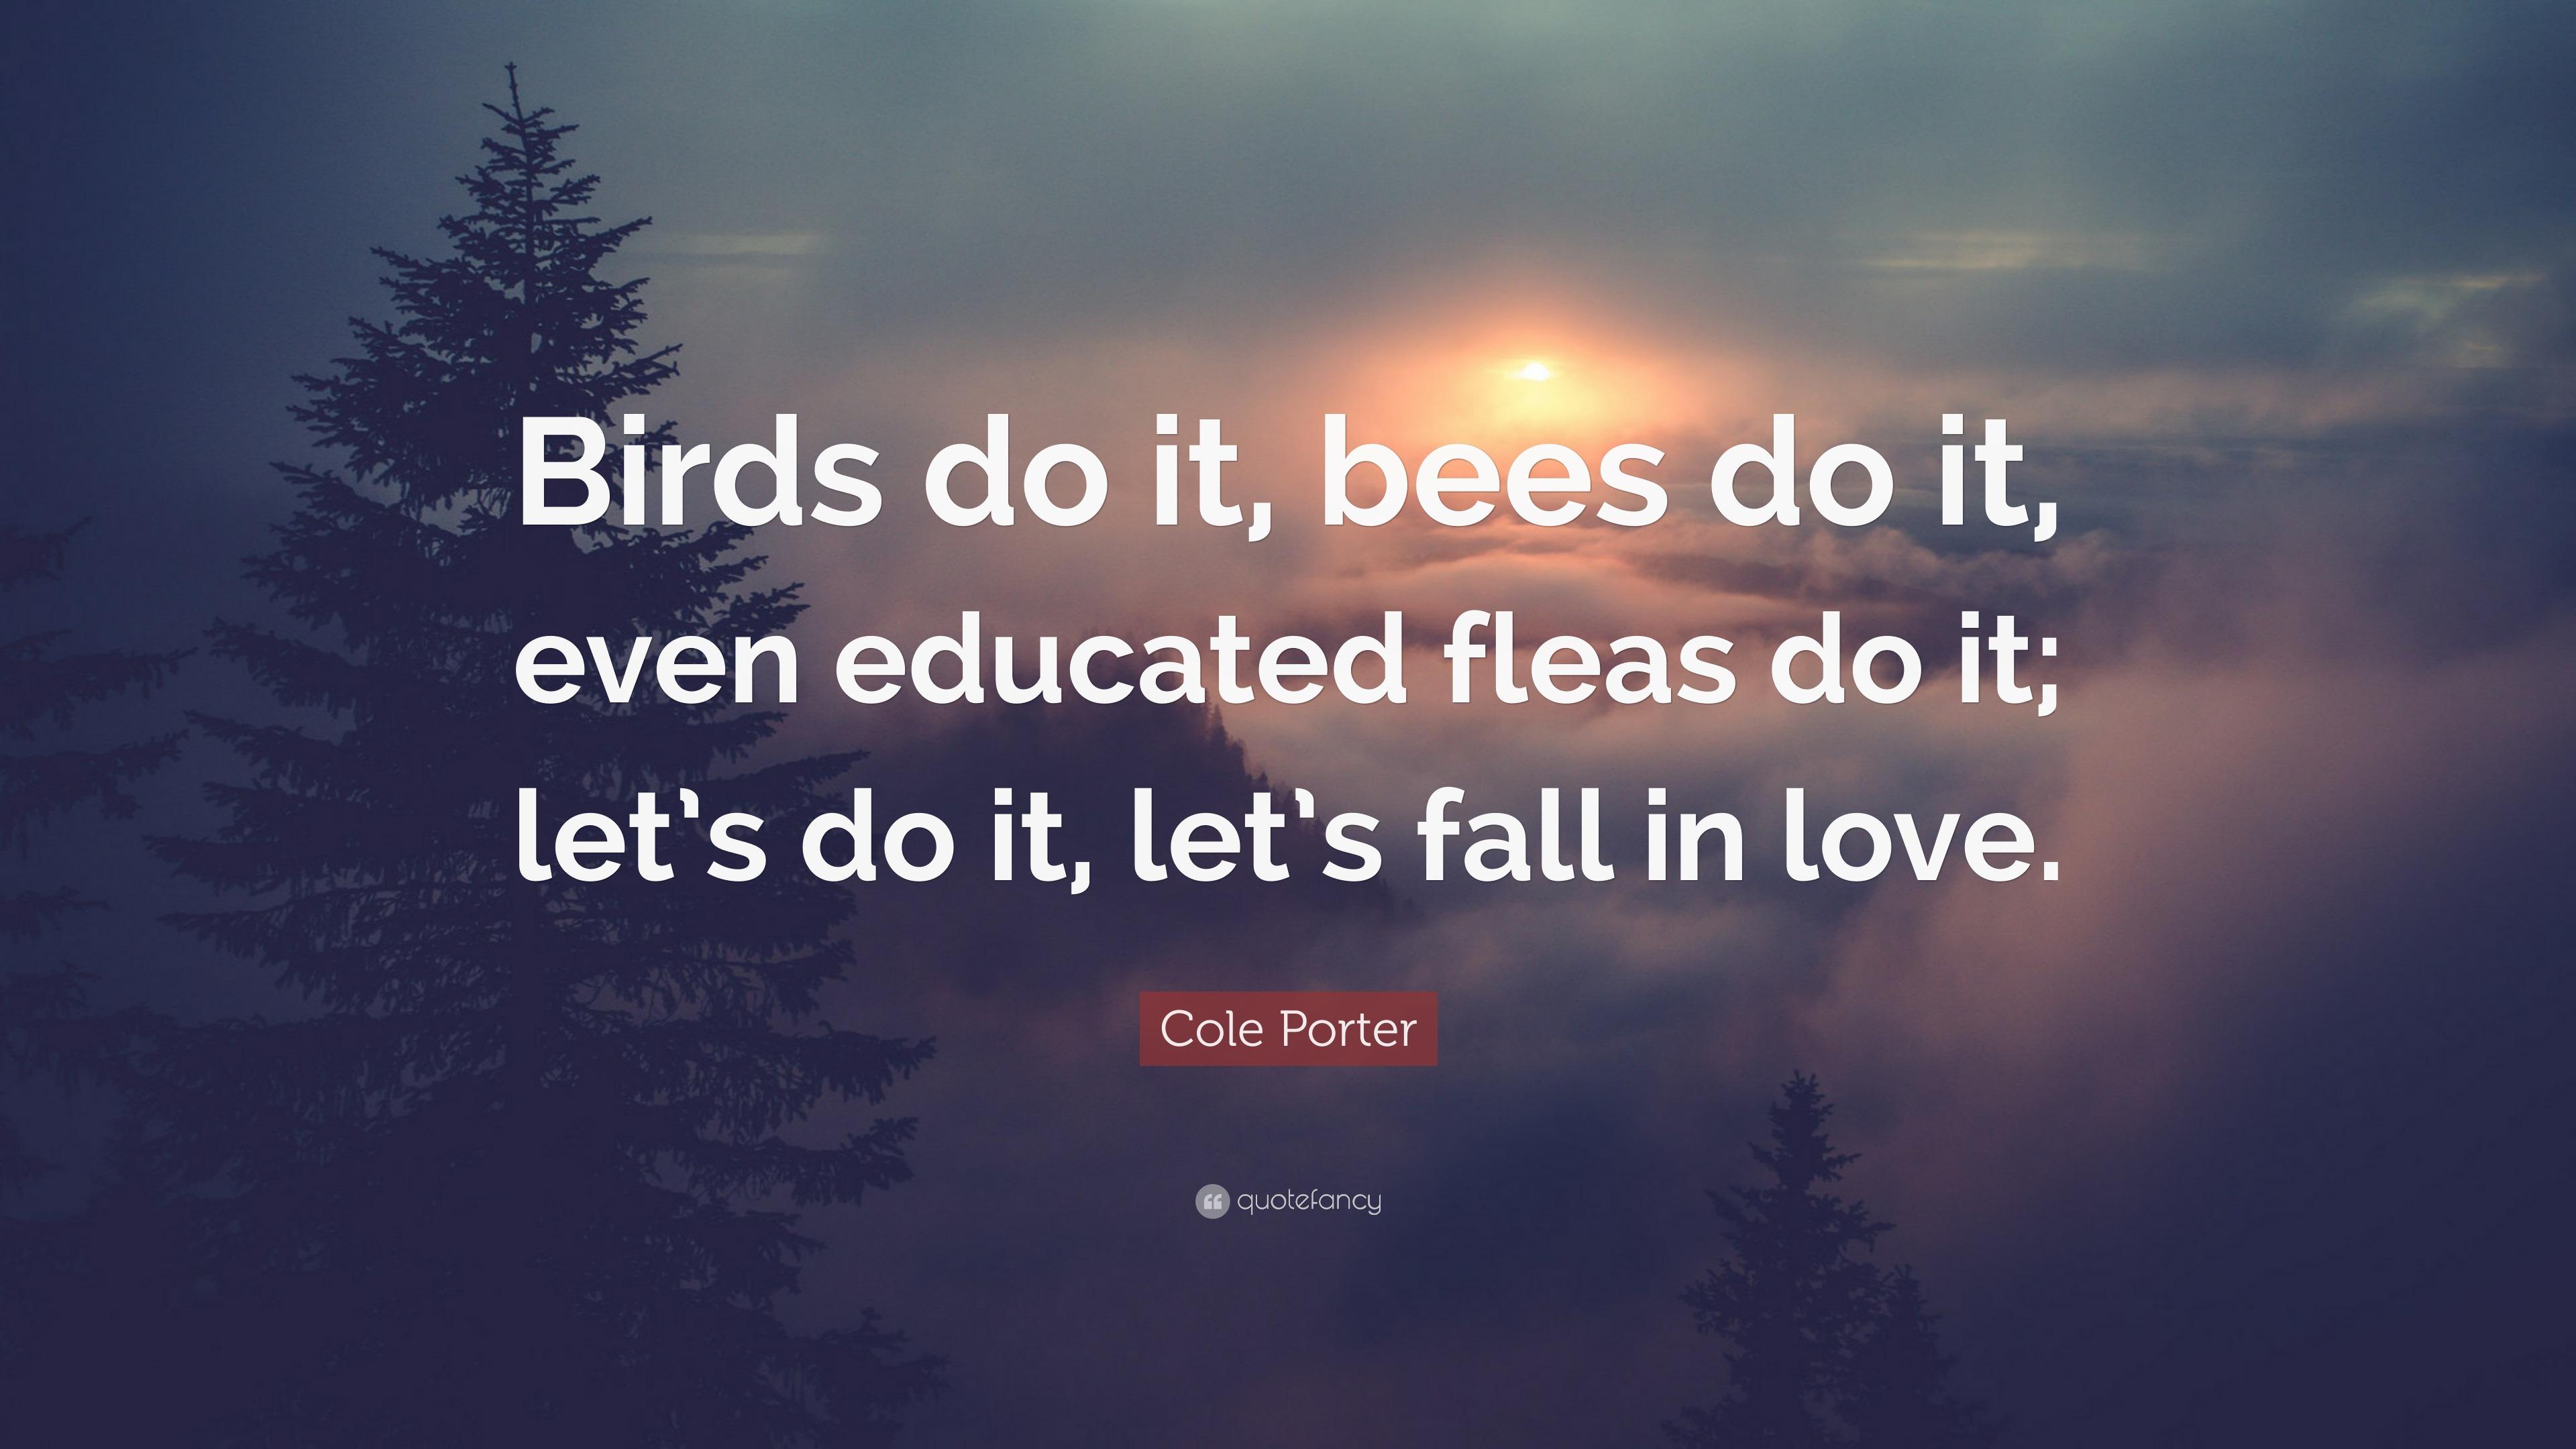 Birds Do It Bees Do It Cole Porter